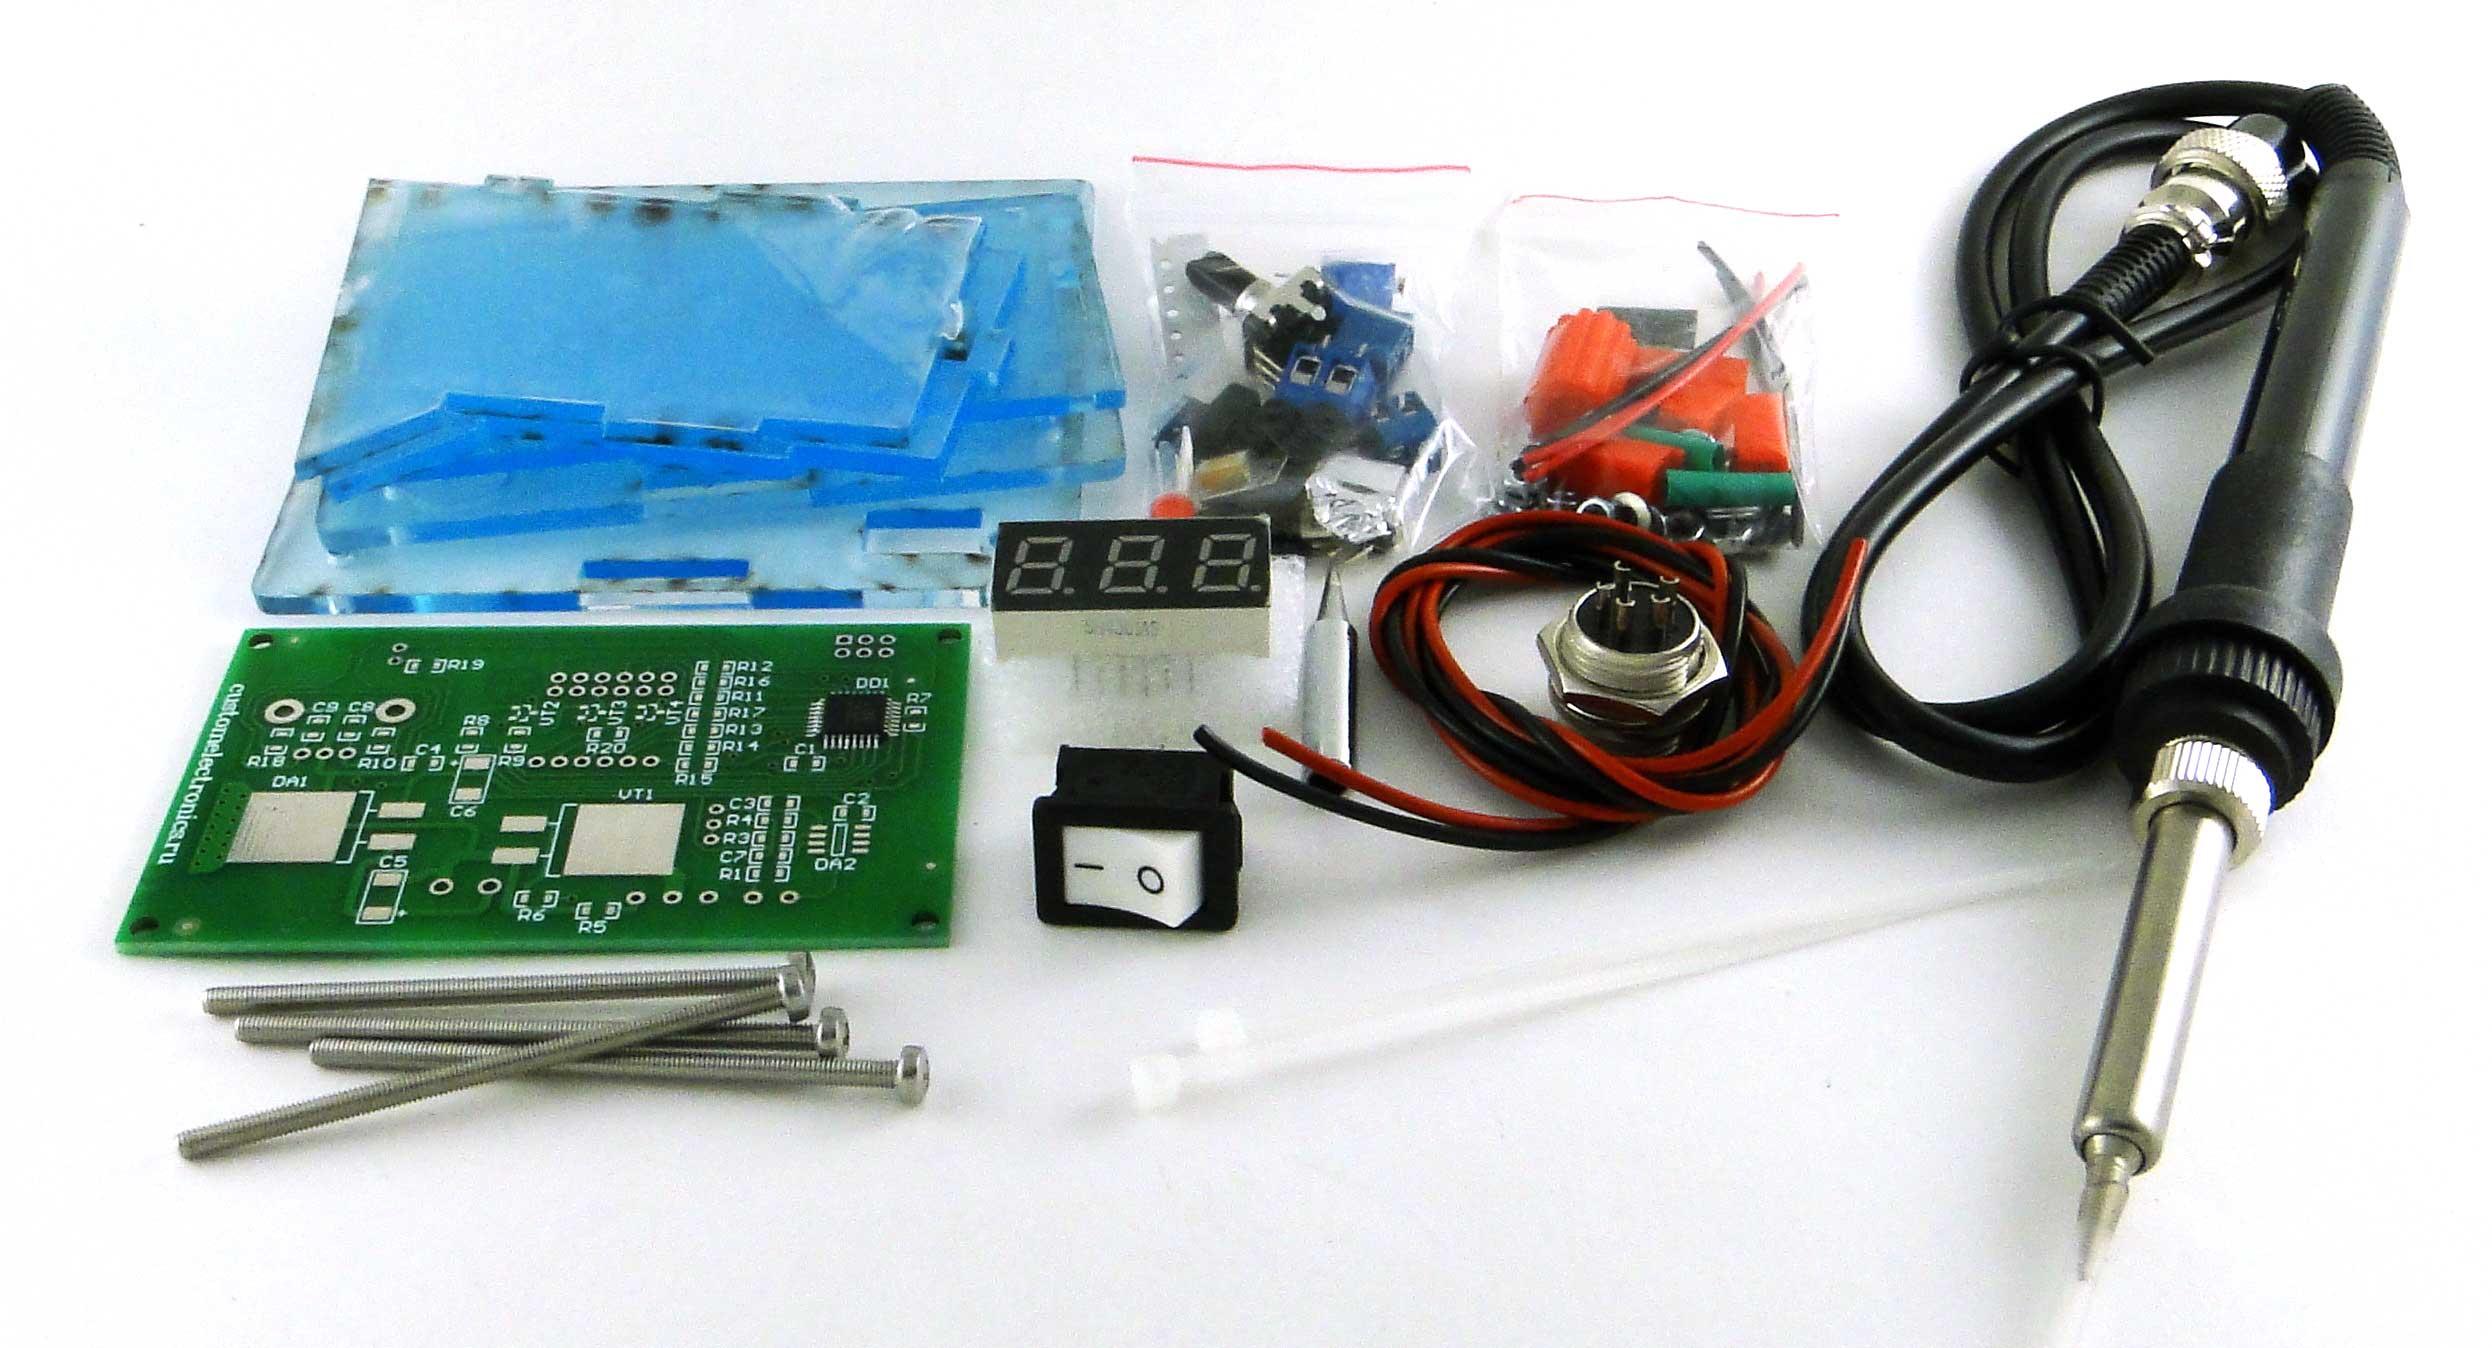 Simple Solder MK936 SMD. Паяльная станция на SMD-компонентах своими руками - 4